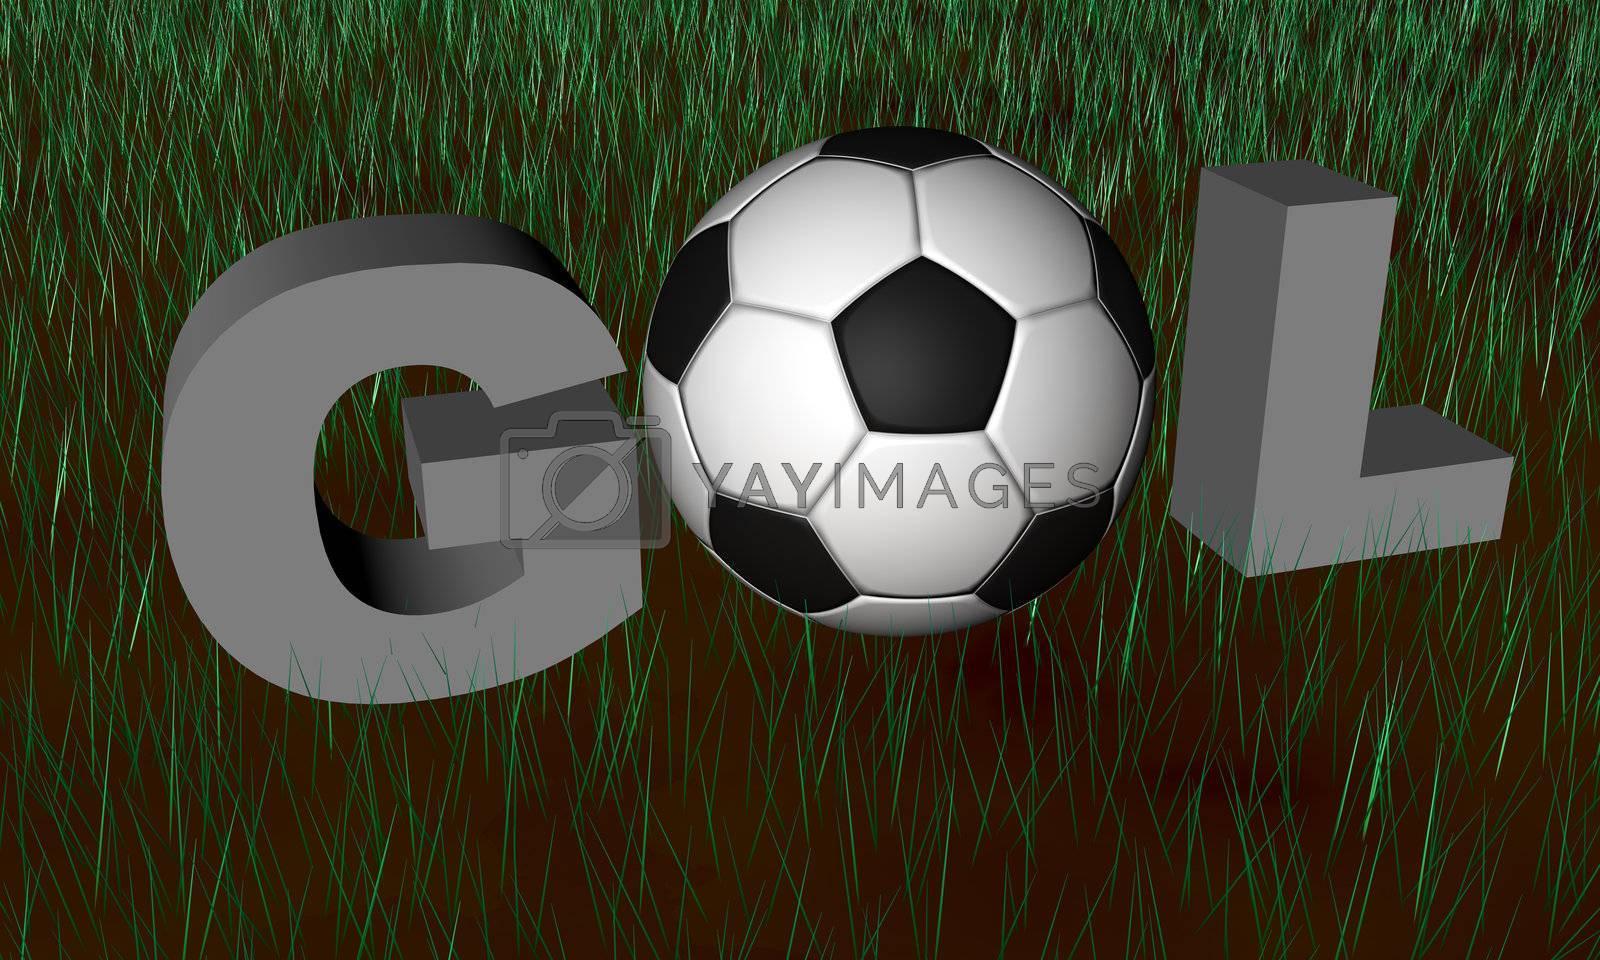 Brazilian word Gol used for Goal in soccer games in render 3D